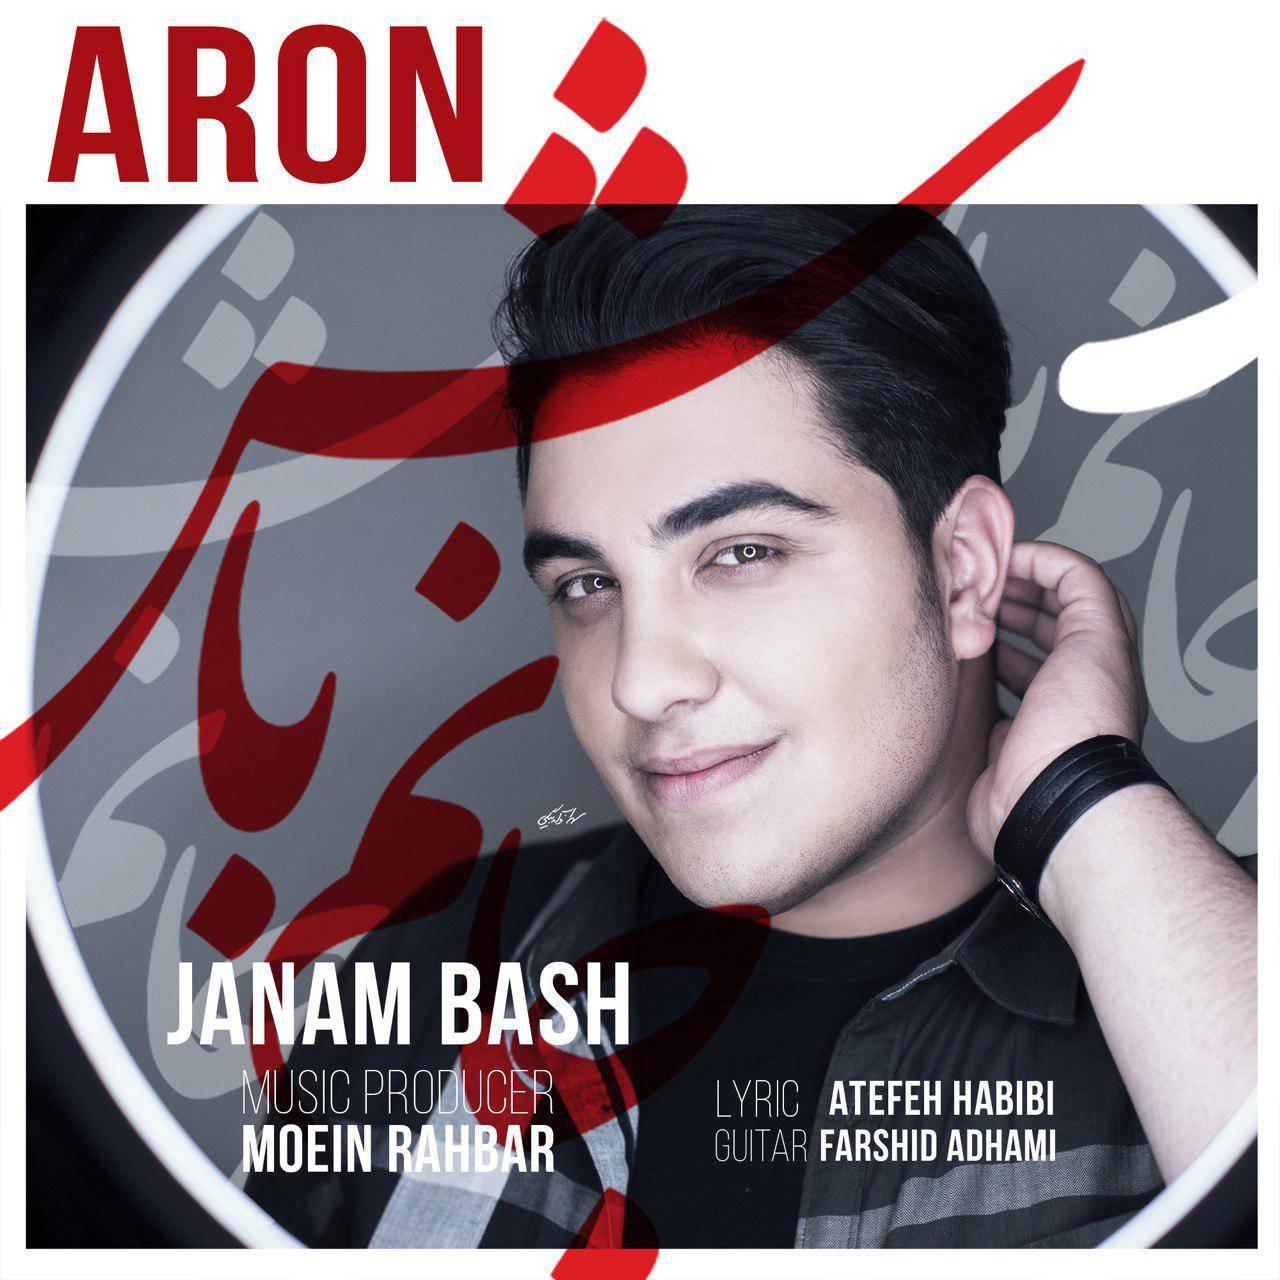 Janam Bash